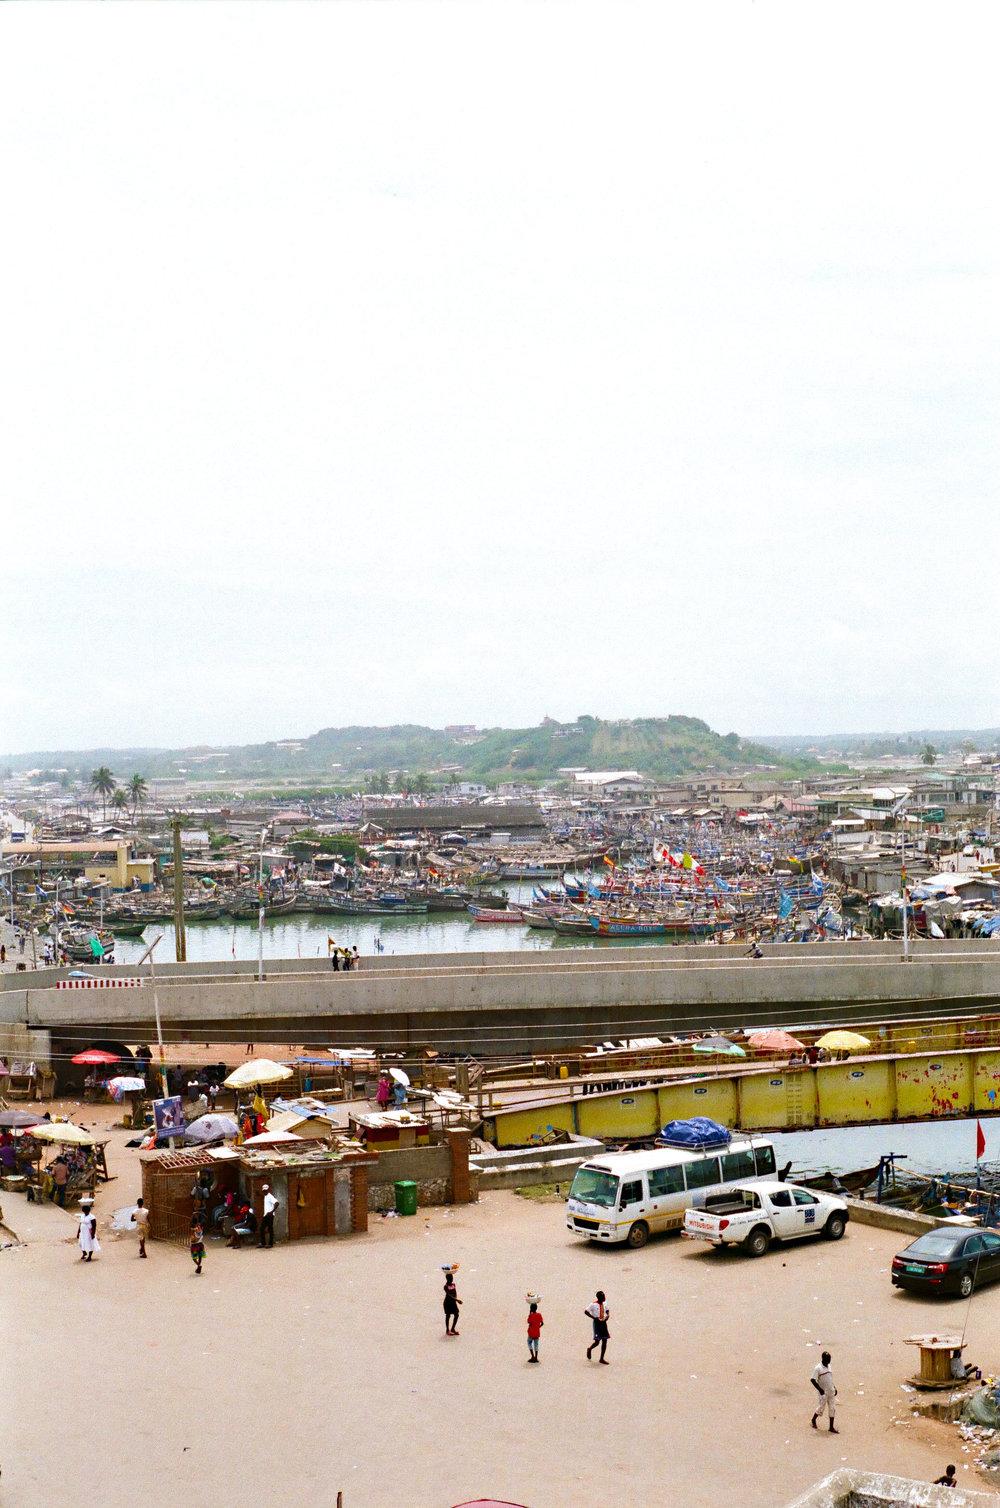 View of Elmina, Ghana from the top of Elmina Castle.